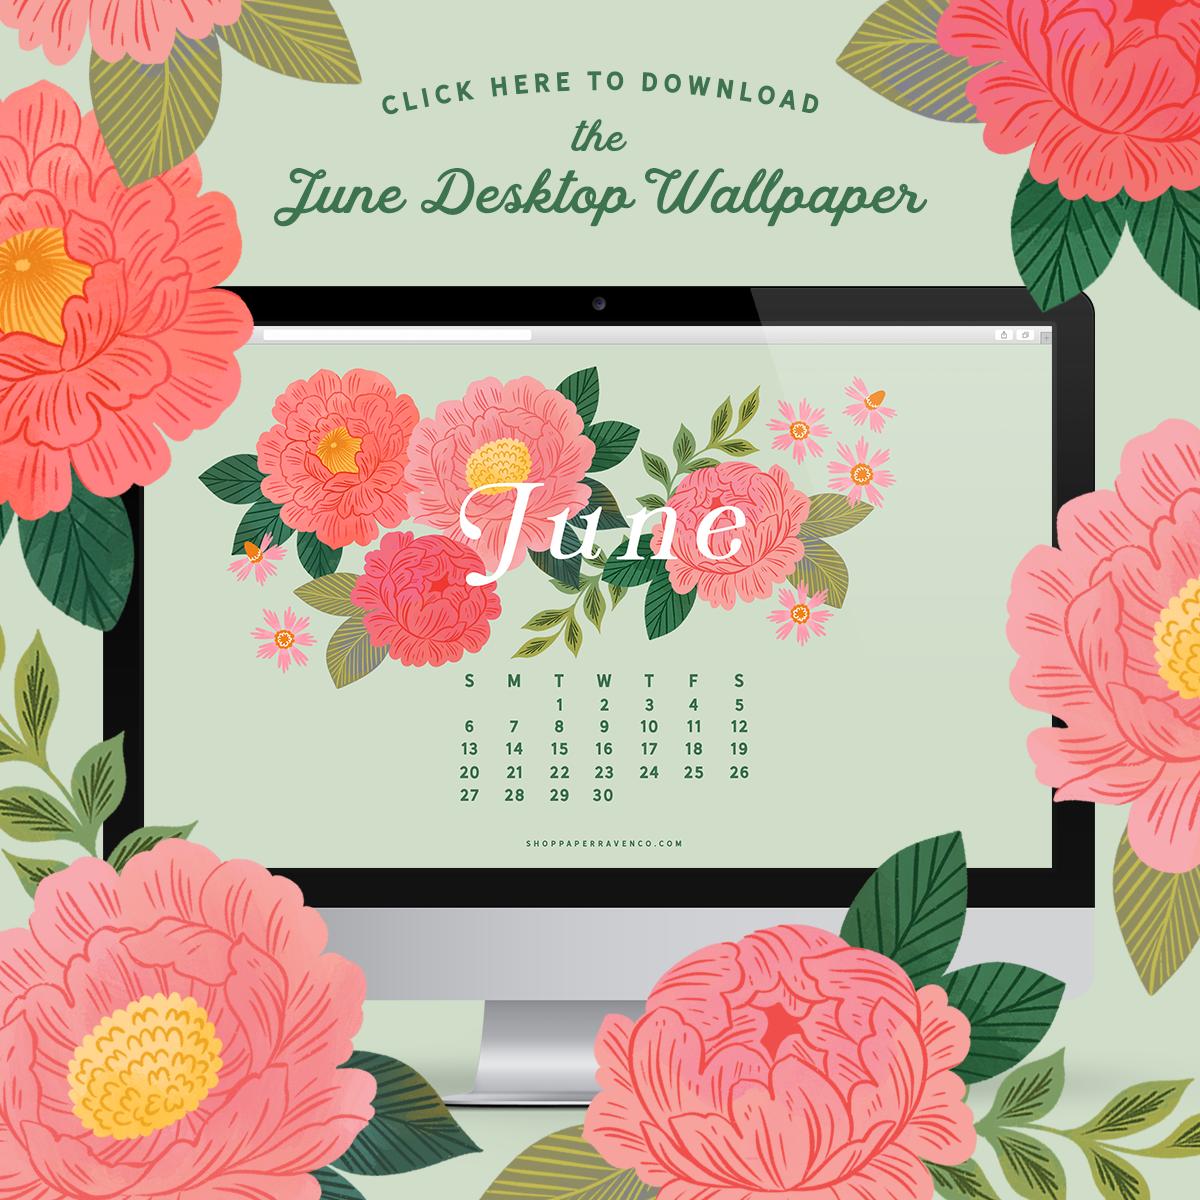 June 2021 Illustrated Desktop Wallpaper by Paper Raven Co. #dressyourtech #desktopwallpaper #desktopdownload